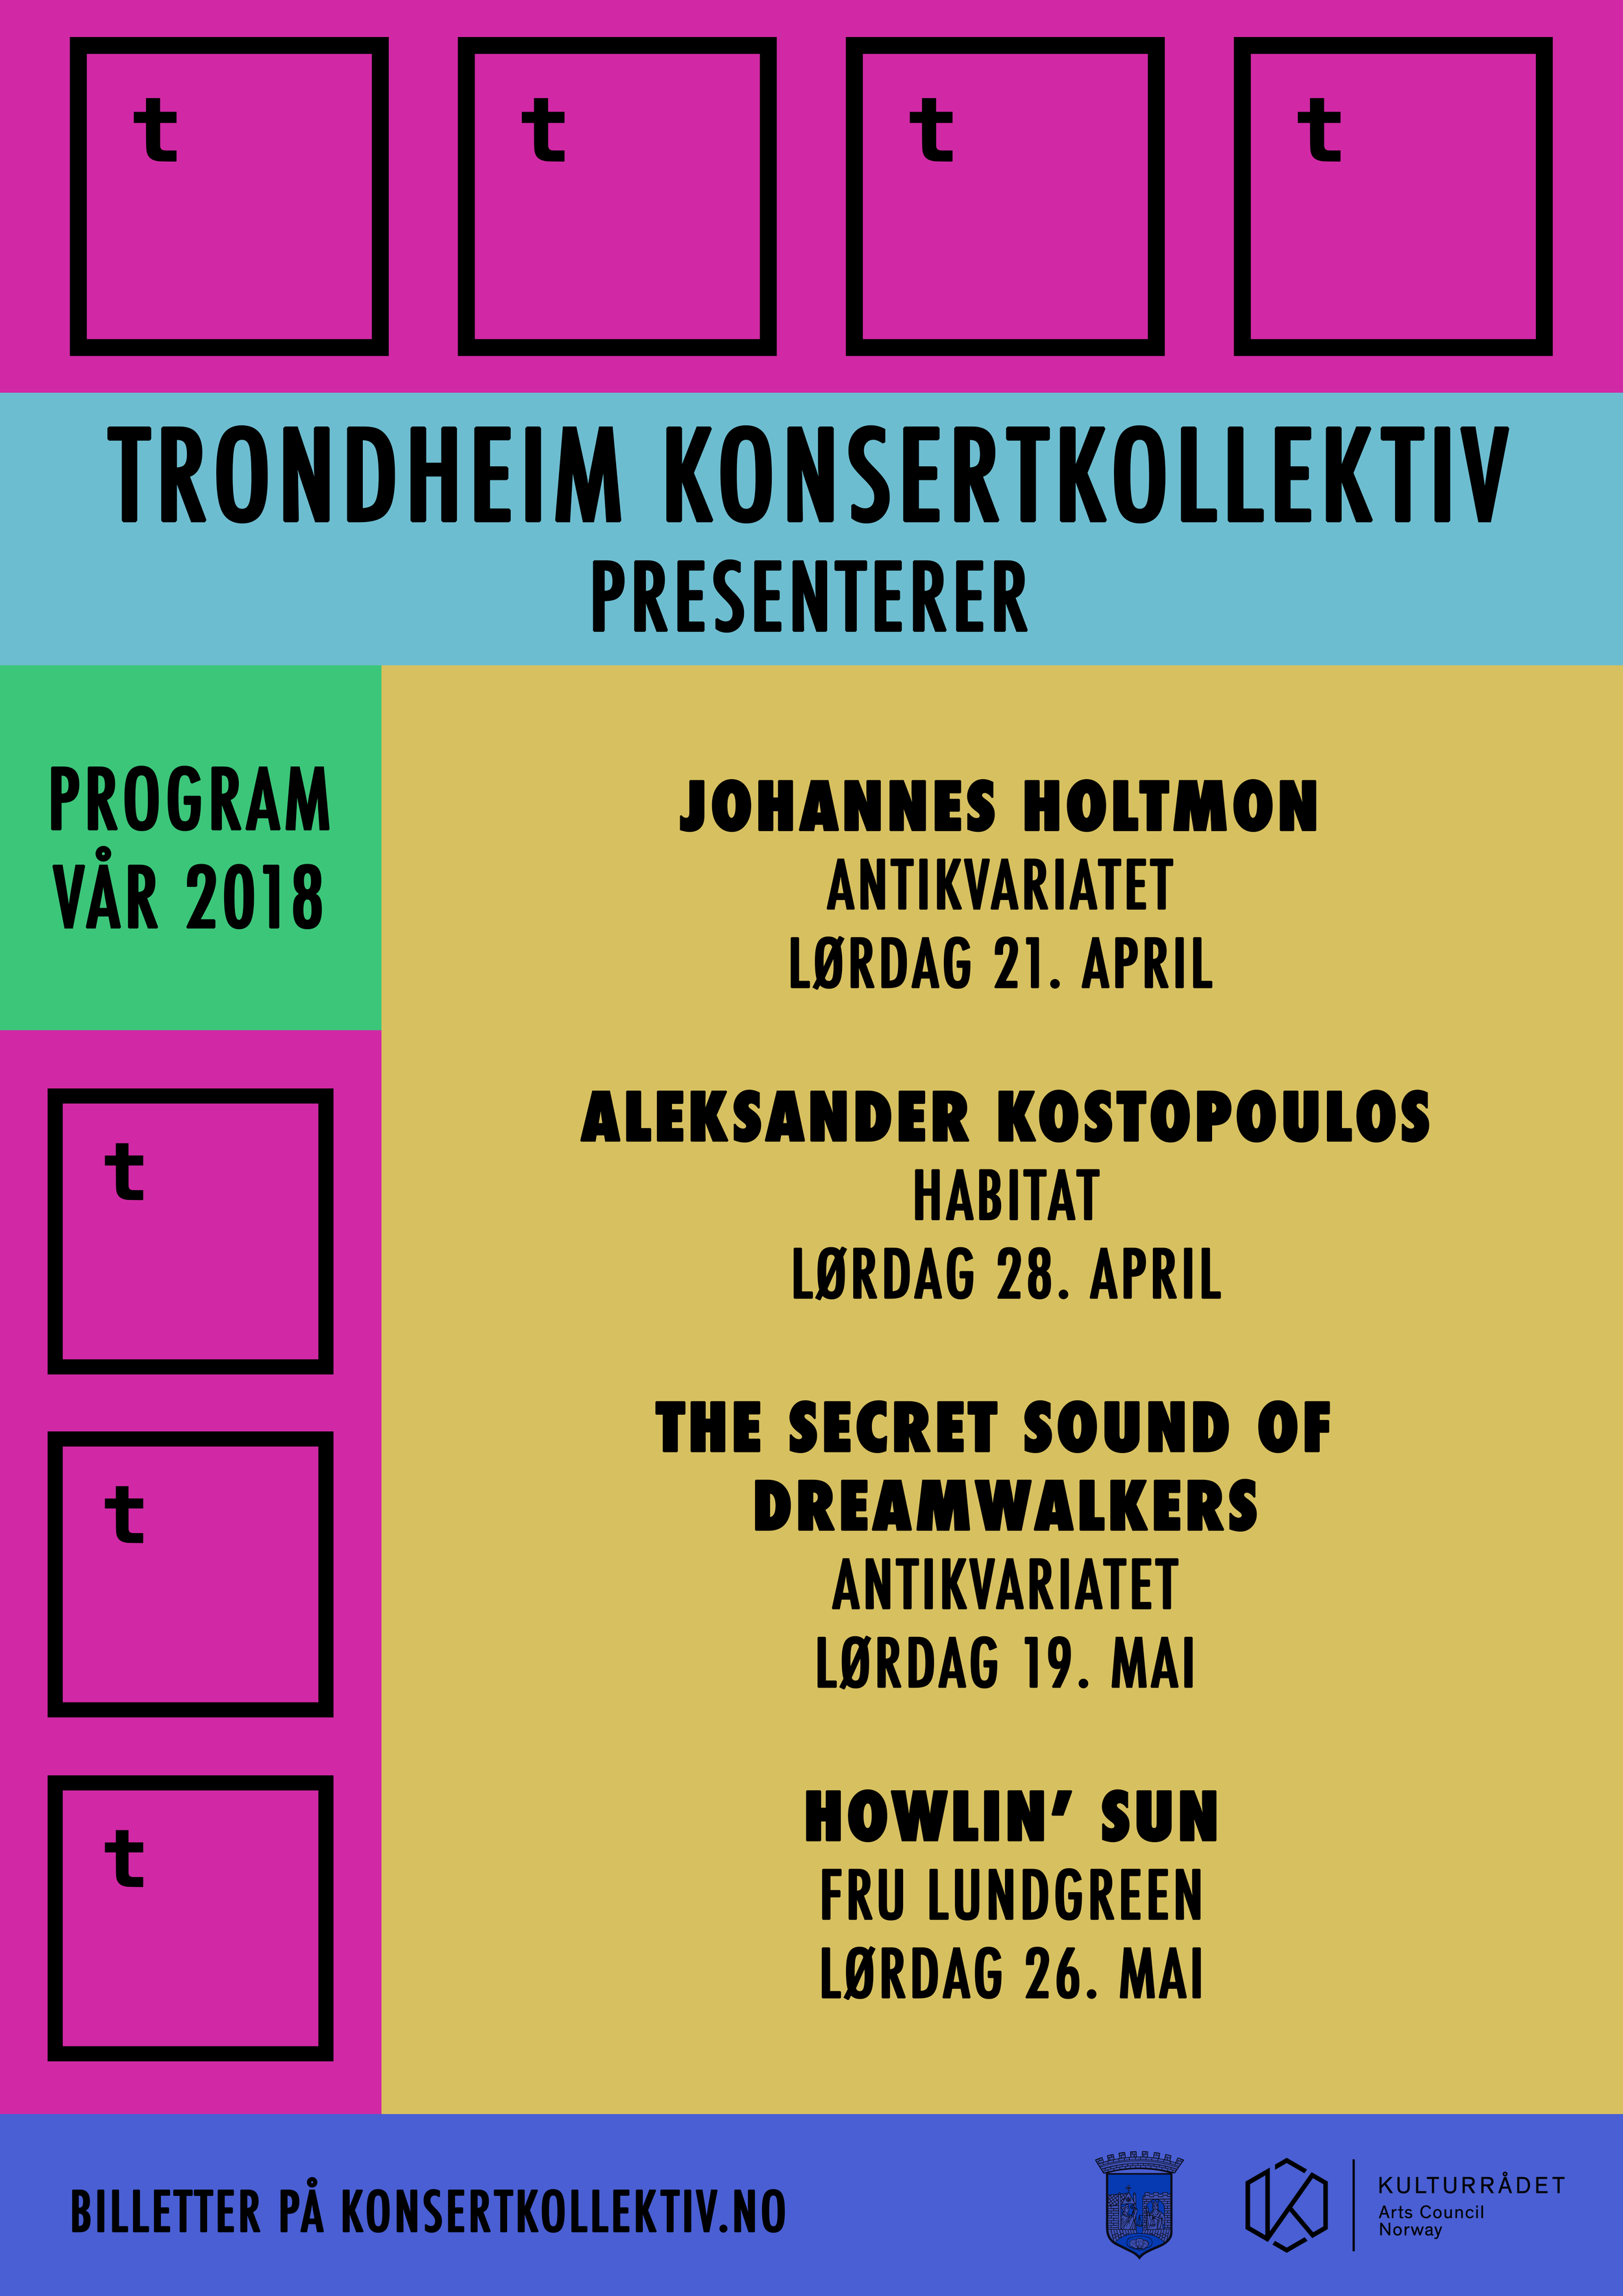 PROGRAMPLAKAT VÅR 2018. DESIGN MARTIN HOPLAND